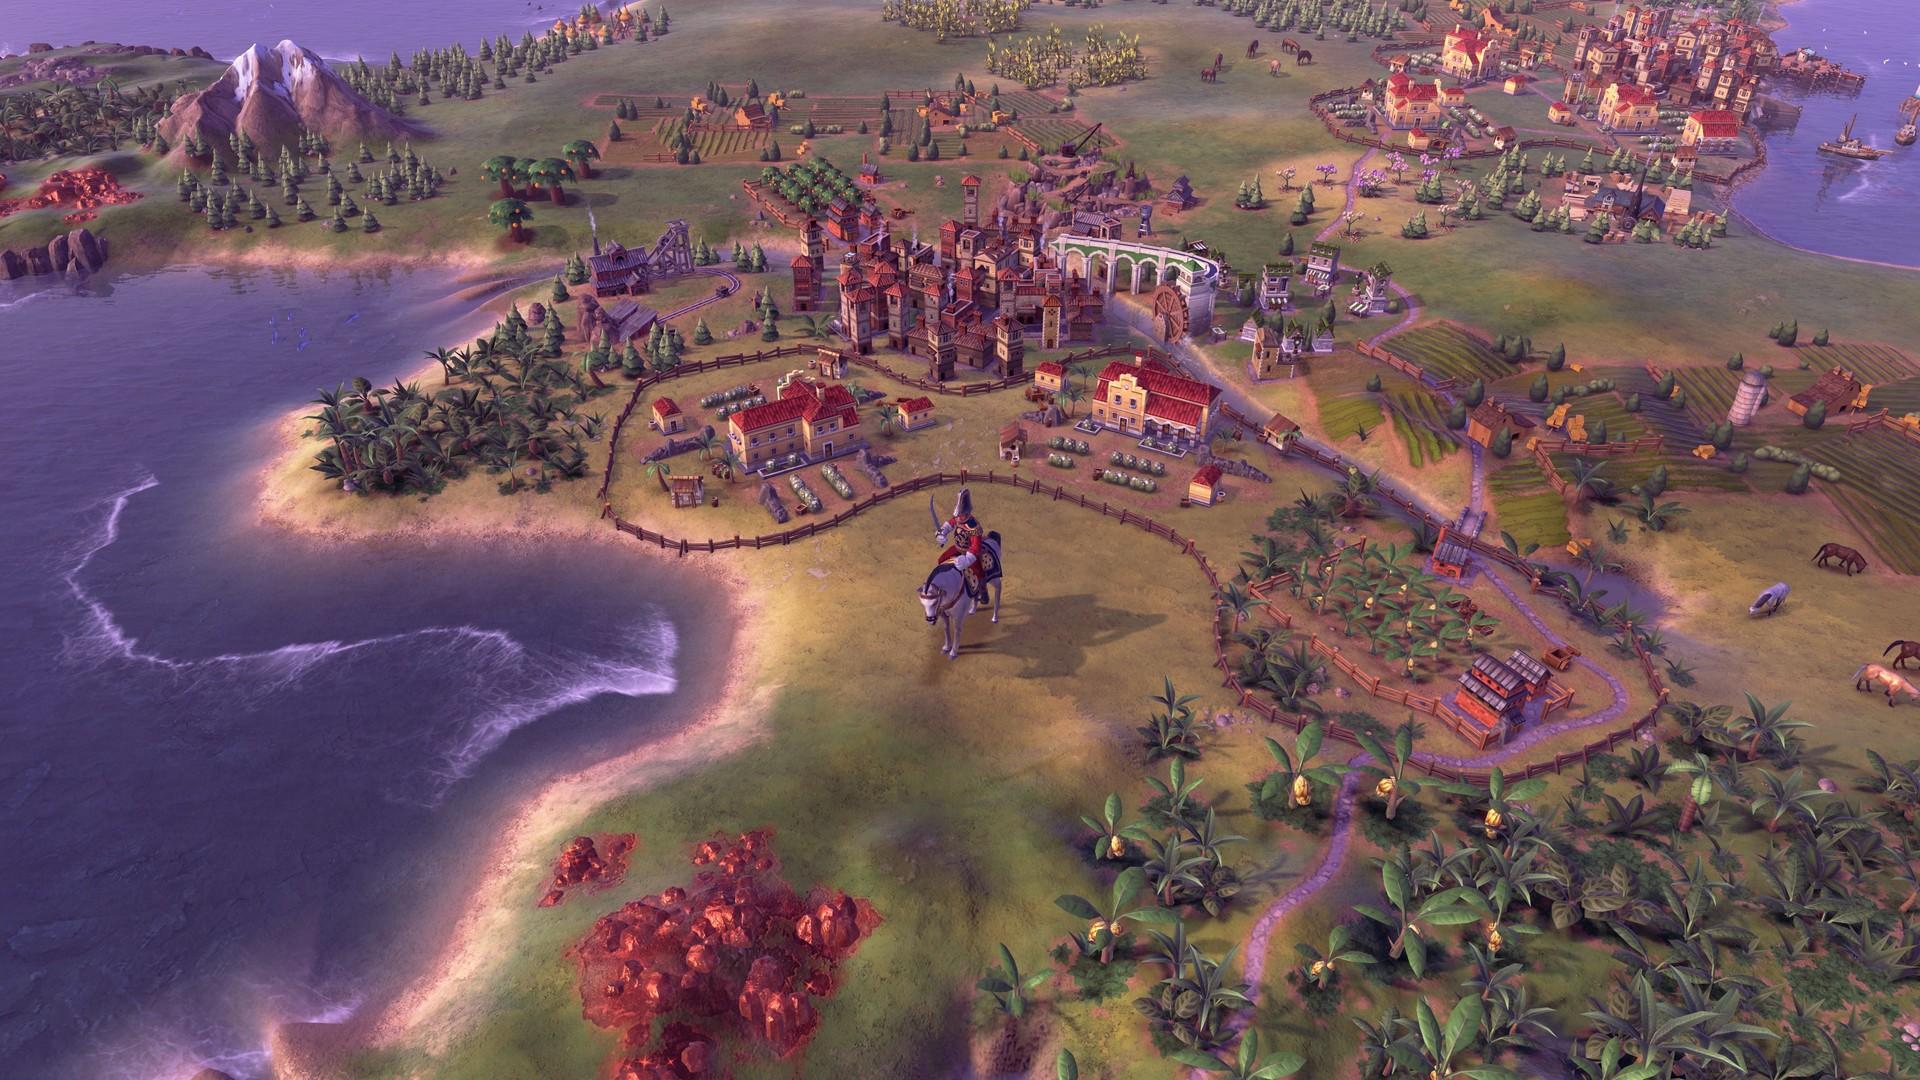 Civilization VI - Maya & Gran Colombia Pack (Steam) | ROW (510c4742-0934-49ef-b145-af14892b92ce)